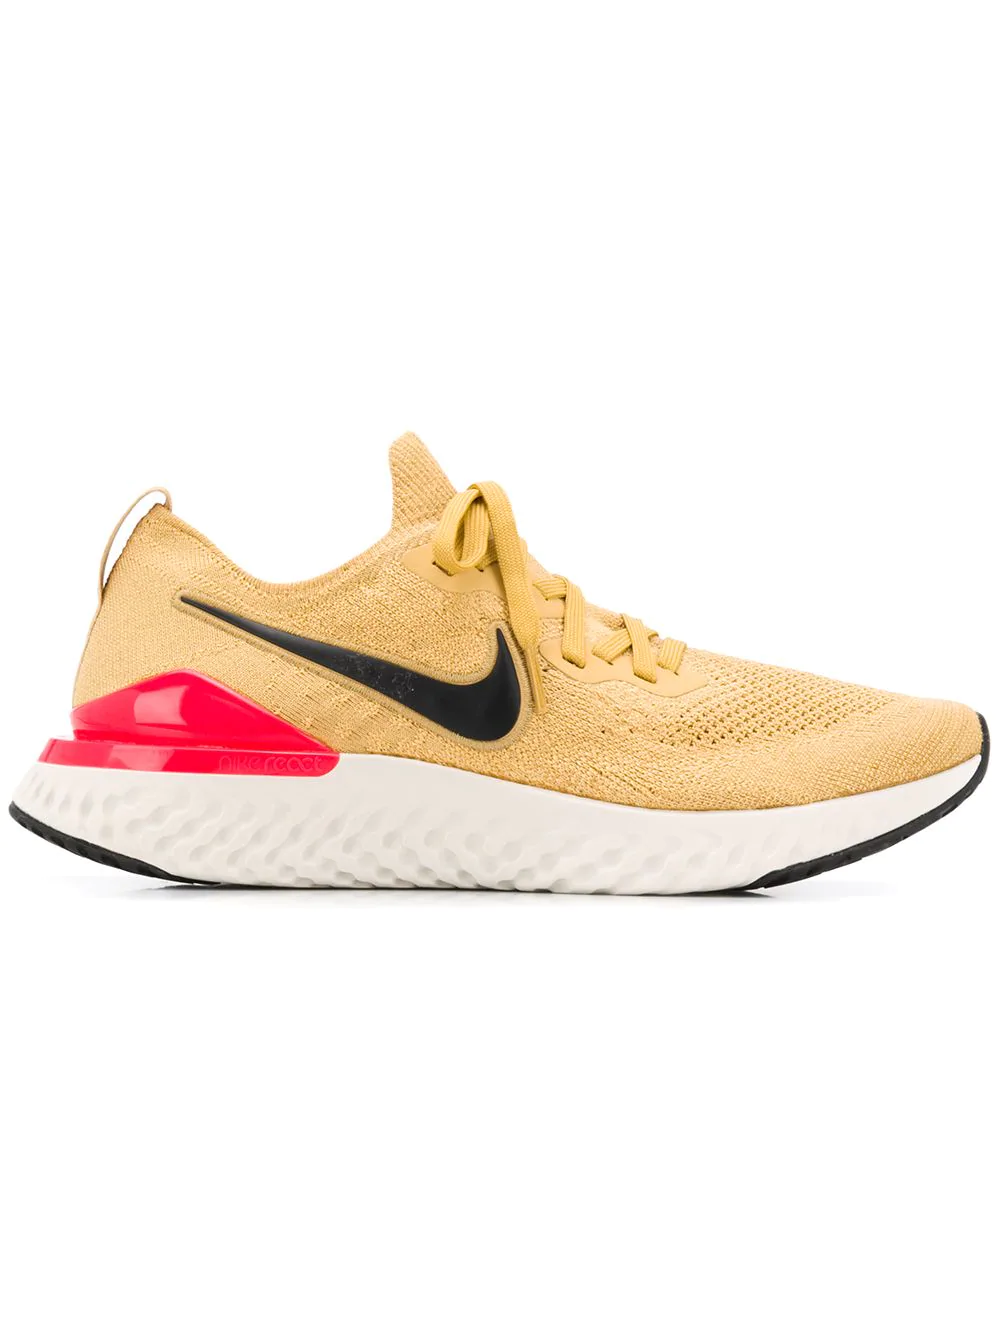 194b3ecce3c78 Nike Epic React Flyknit 2 Sneakers - Yellow